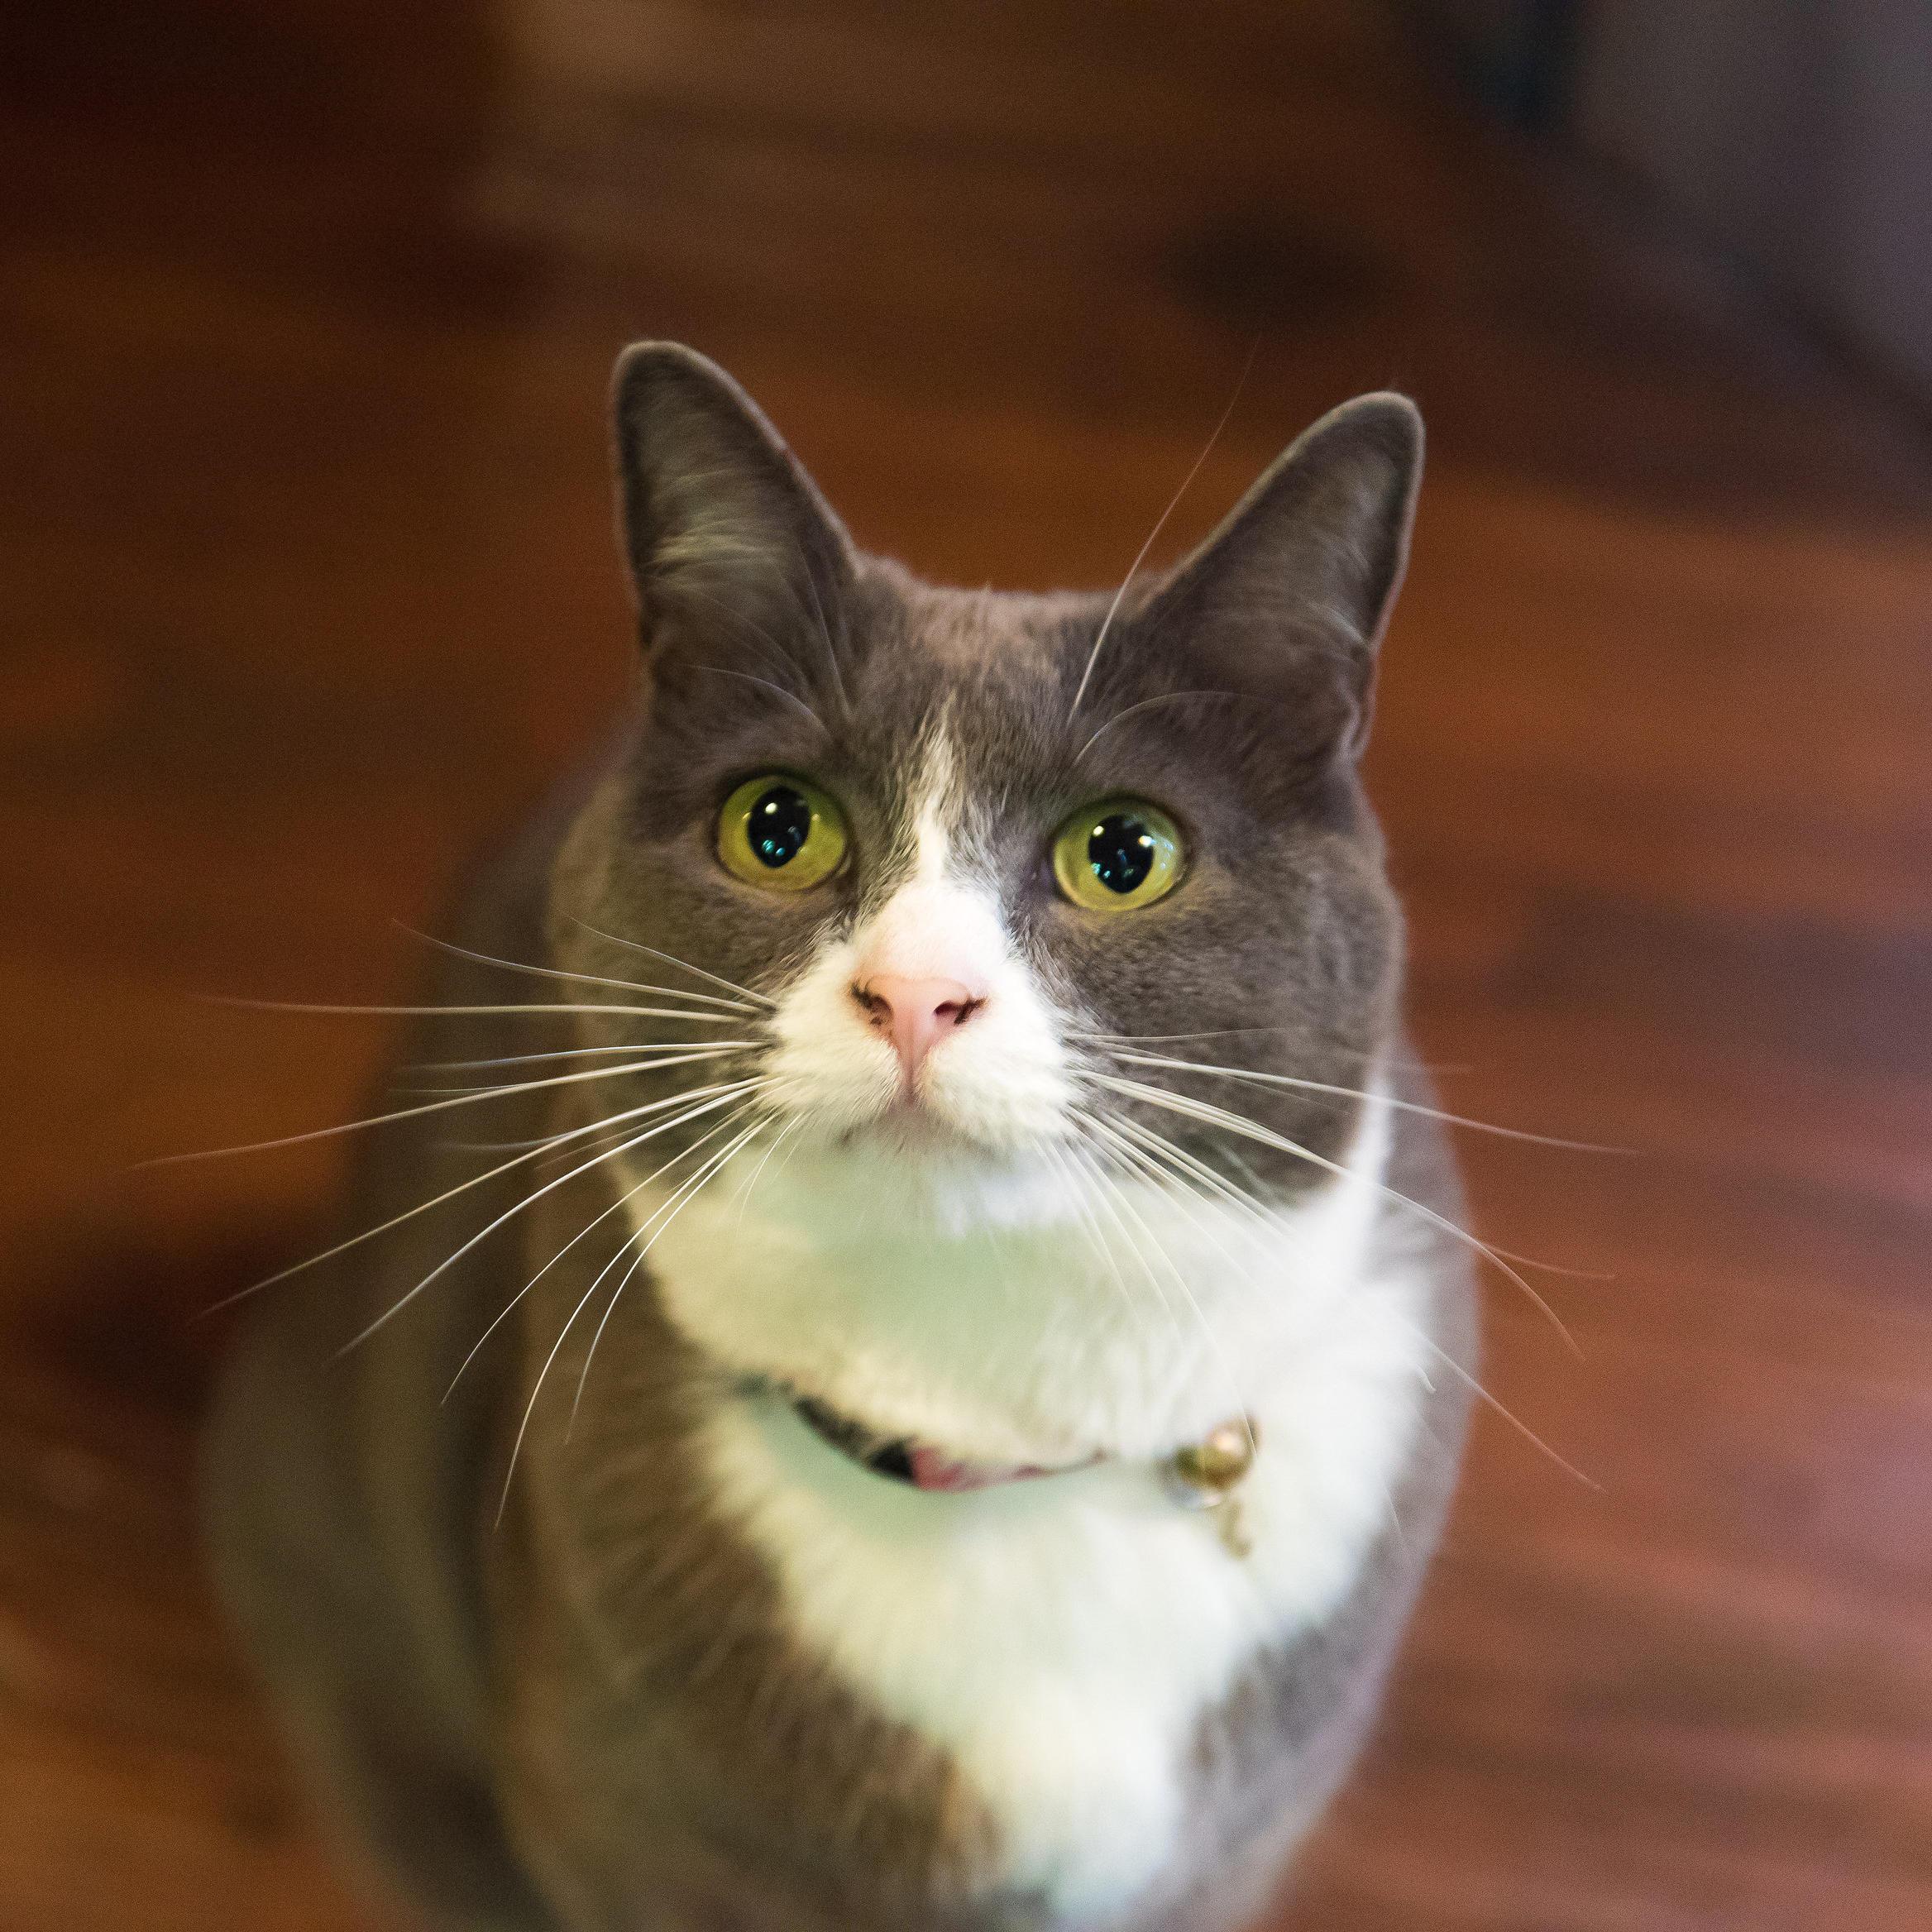 An Image of a cat at Pets program in Alderbrook Resort